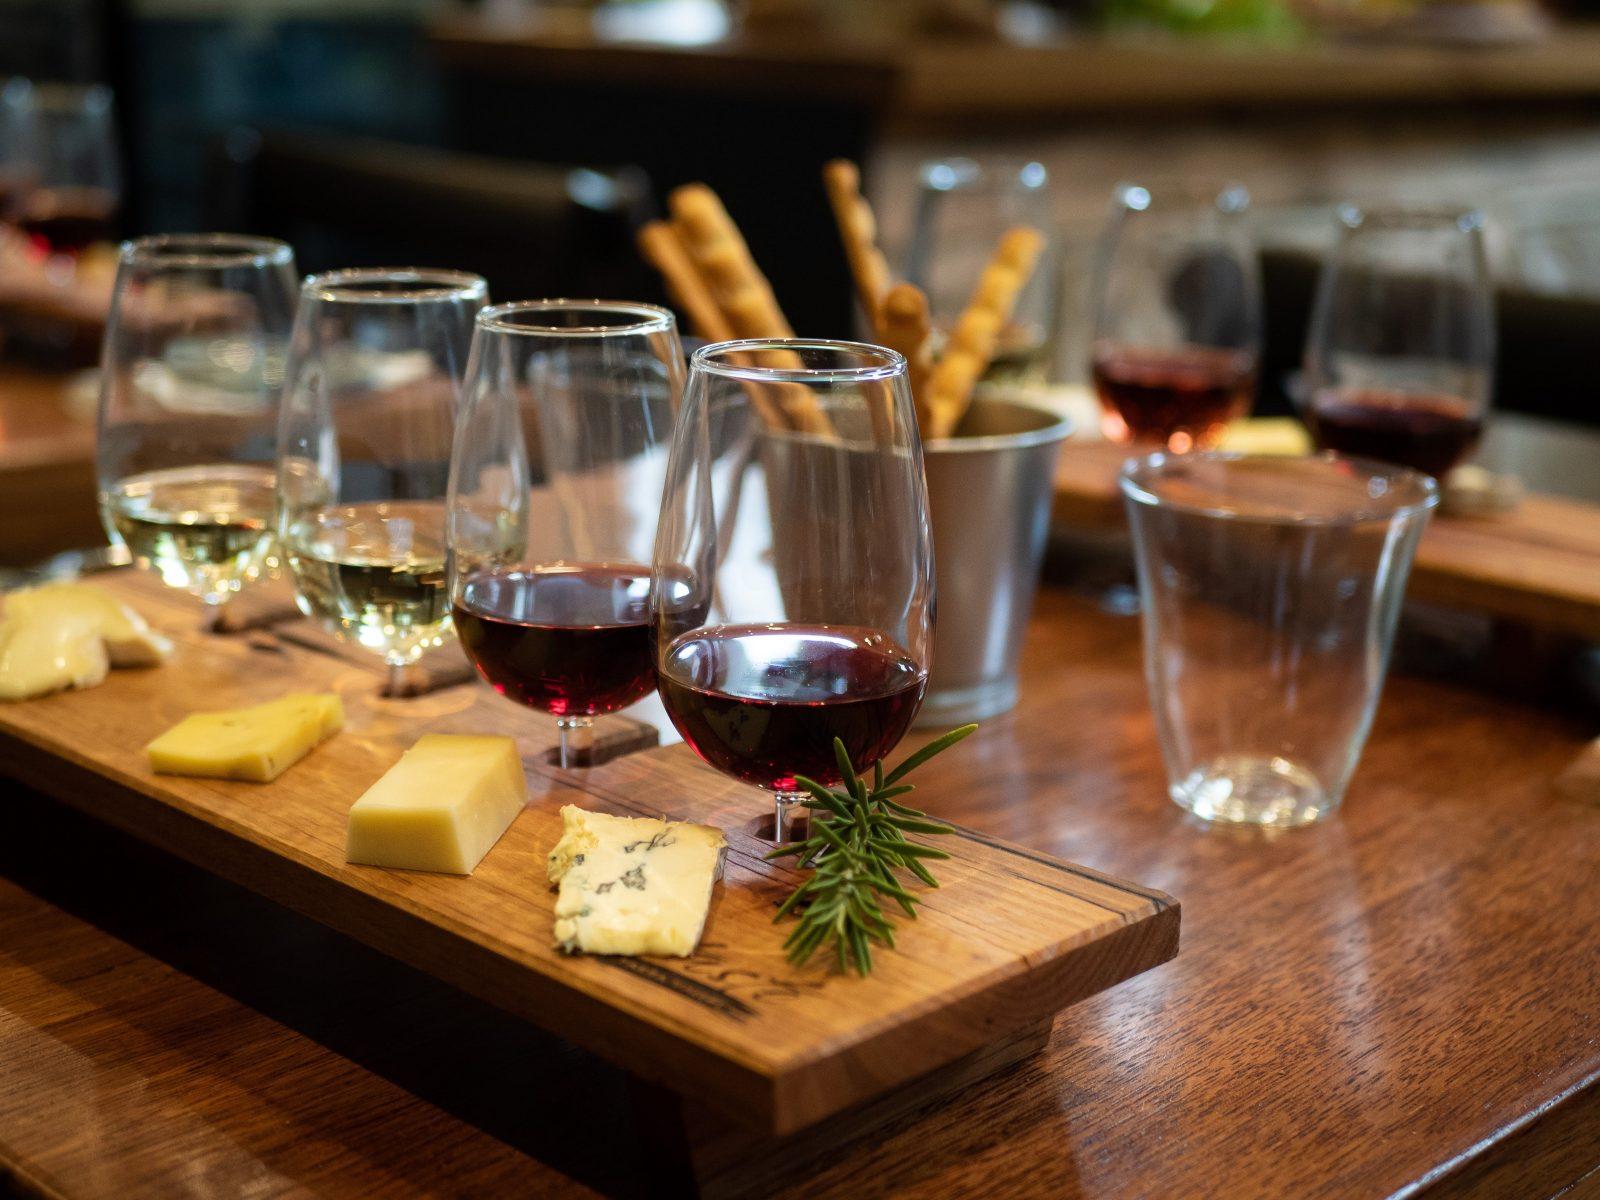 Tasting flight cheese and wine